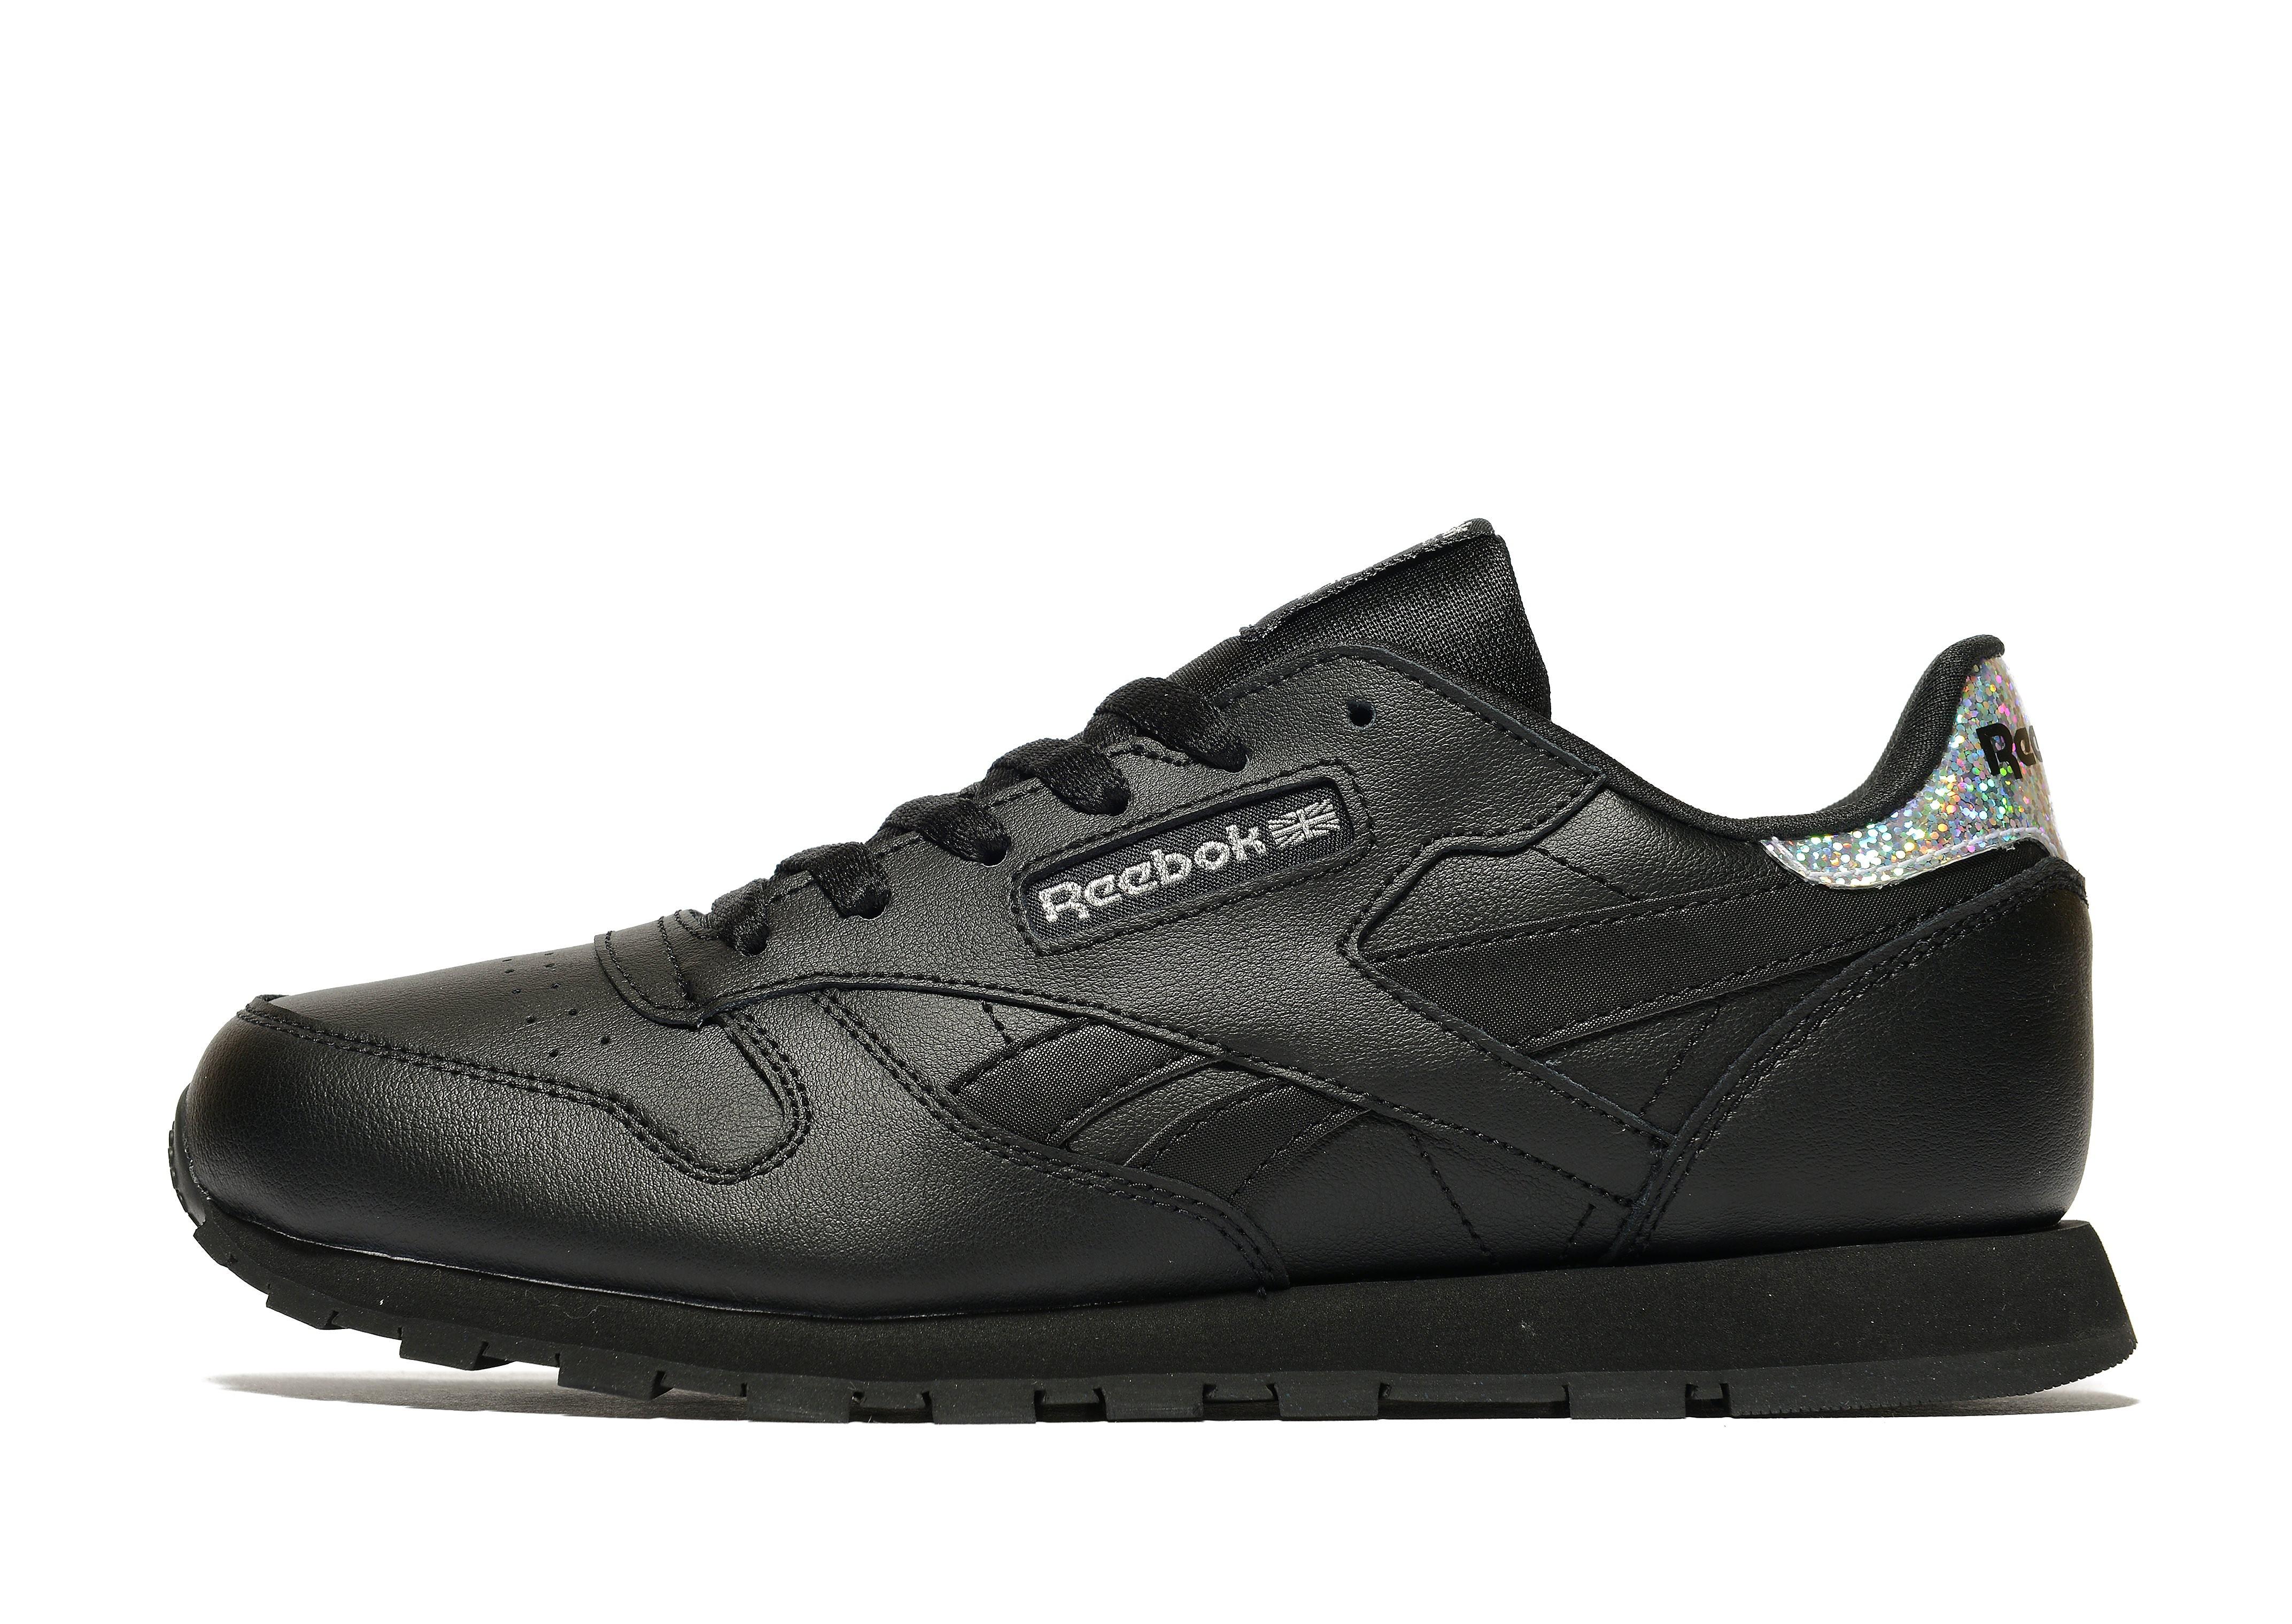 Reebok Classic Leather Junior